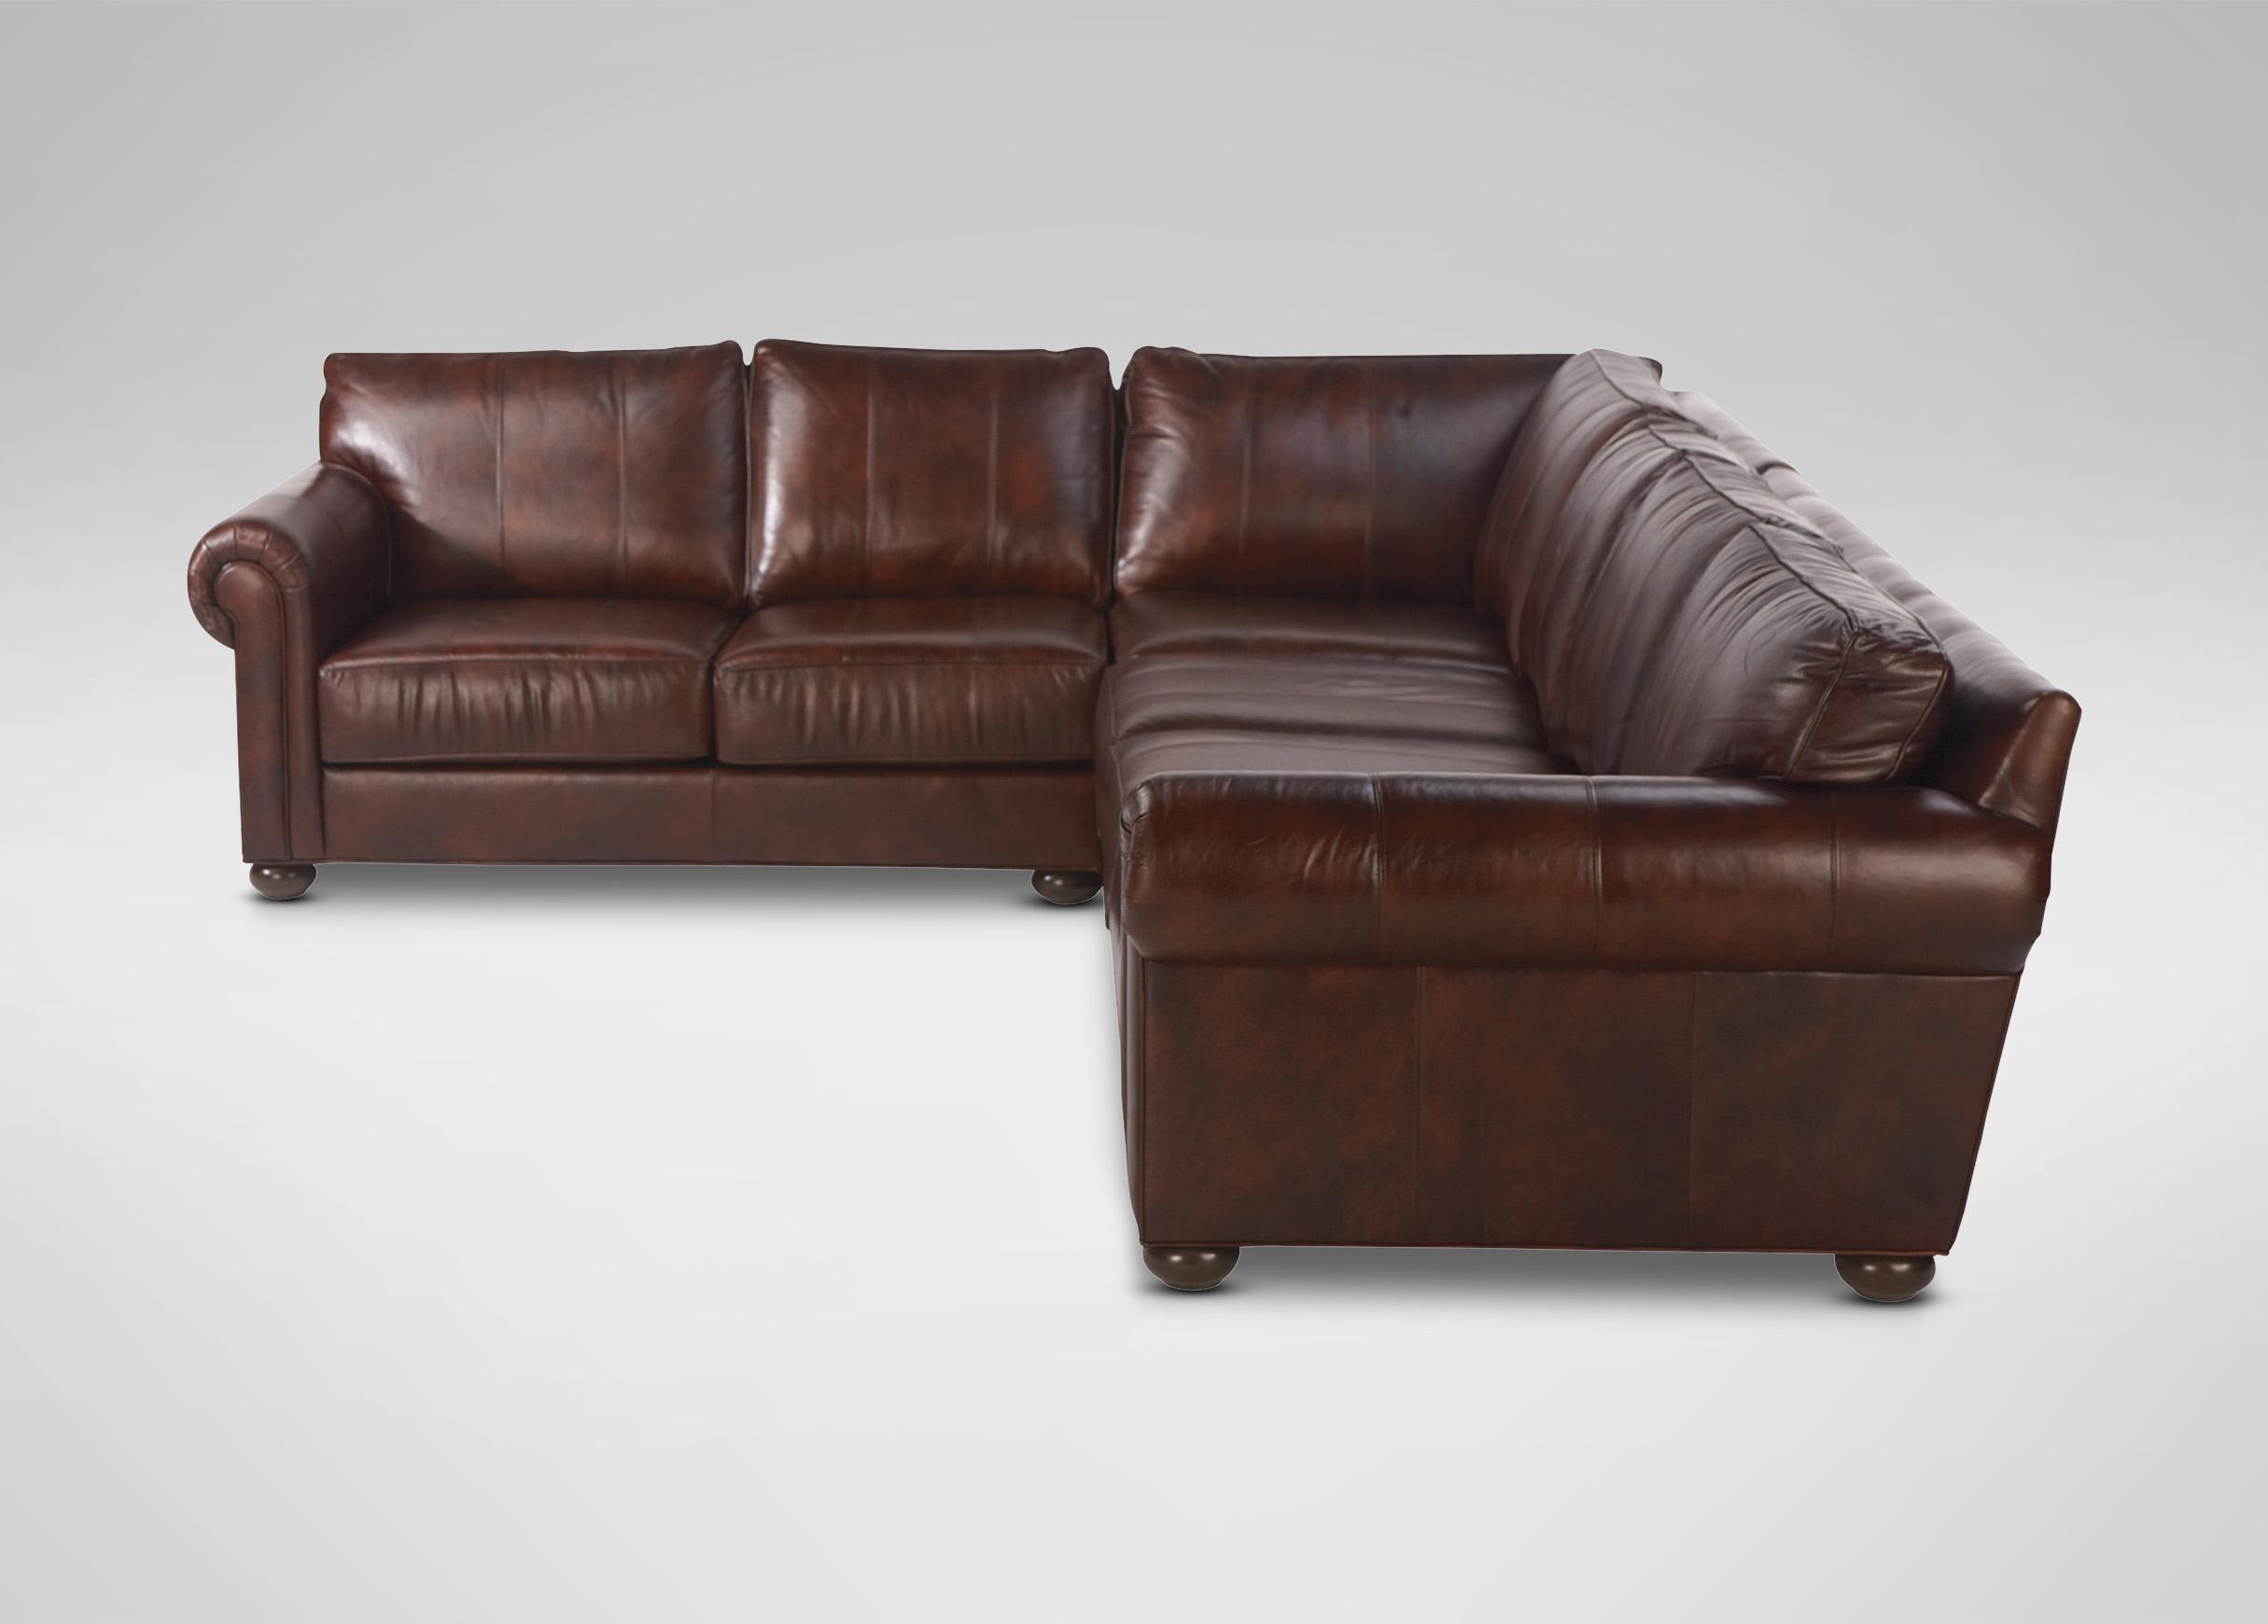 20 choices of ethan allen whitney sofas sofa ideas for Ethan allen furniture